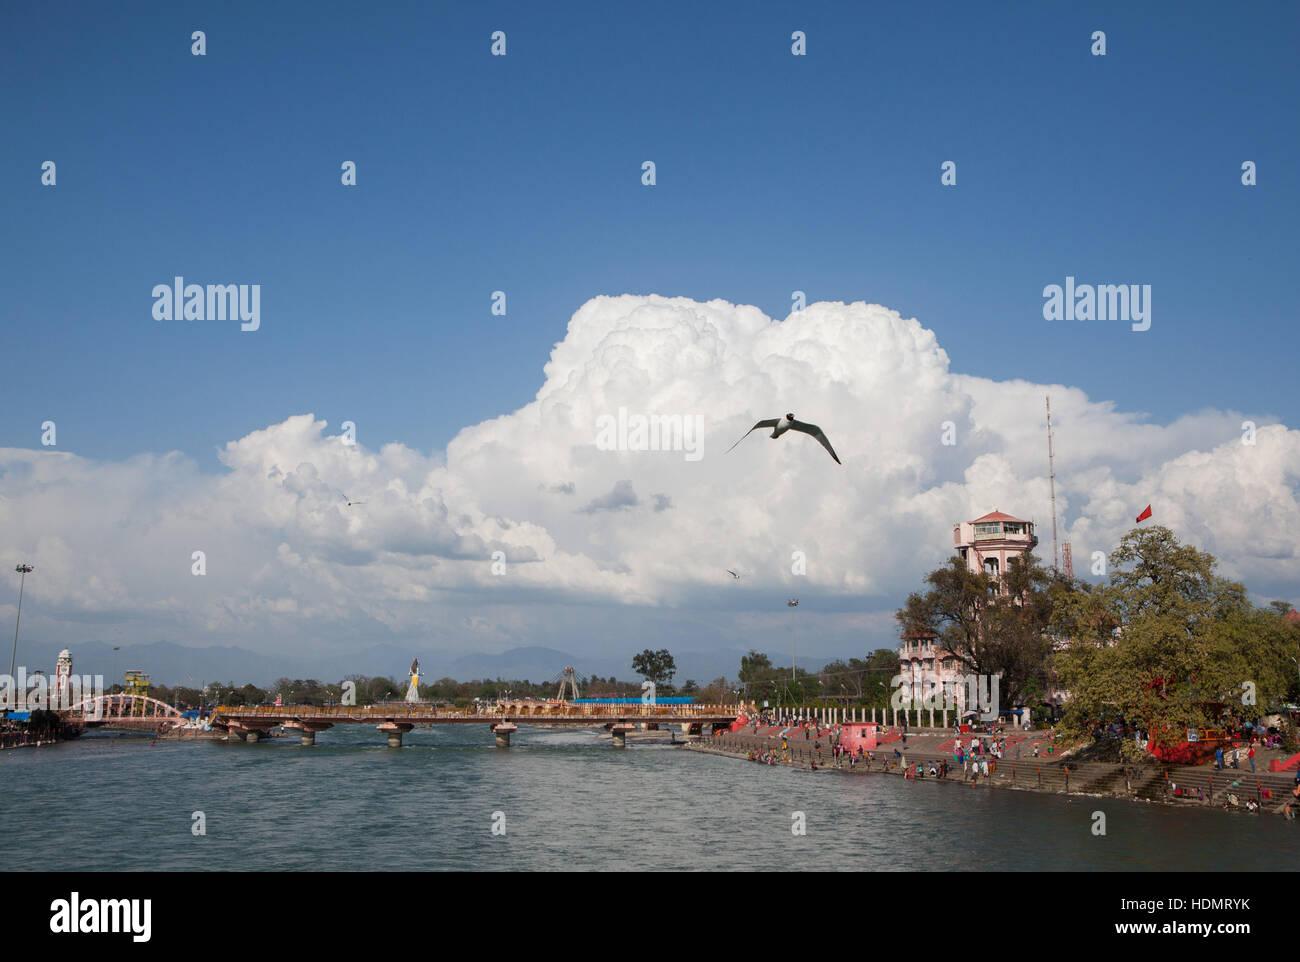 Ganges river in Haridwar, India   © Juergen Hasenkopf - Stock Image